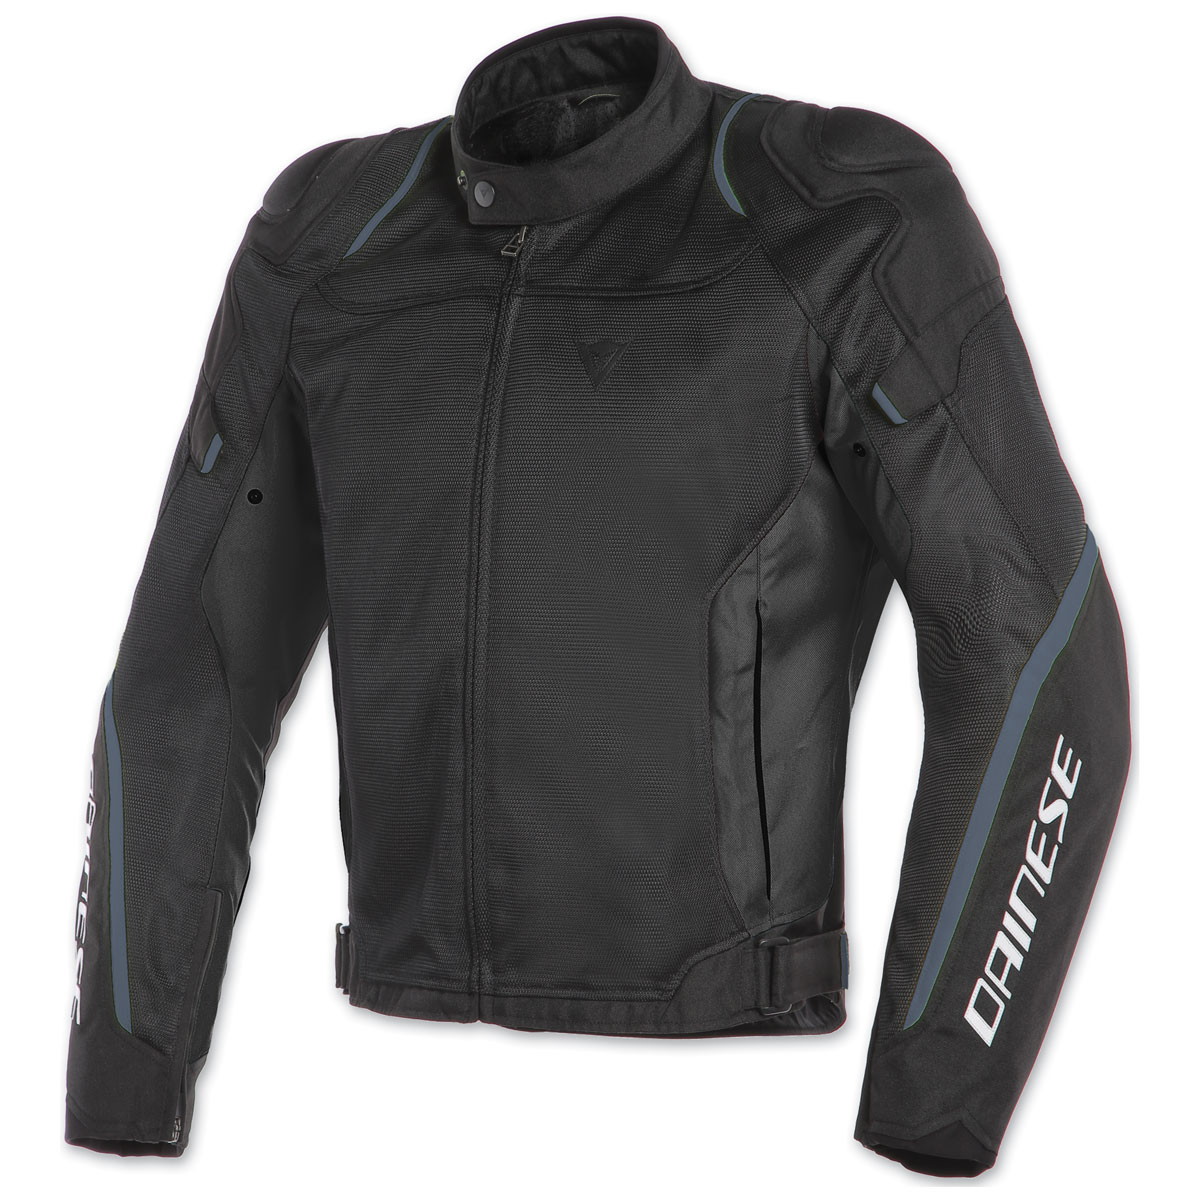 Dainese Men's Air Master Black/Black/Anthracite Textile Jacket